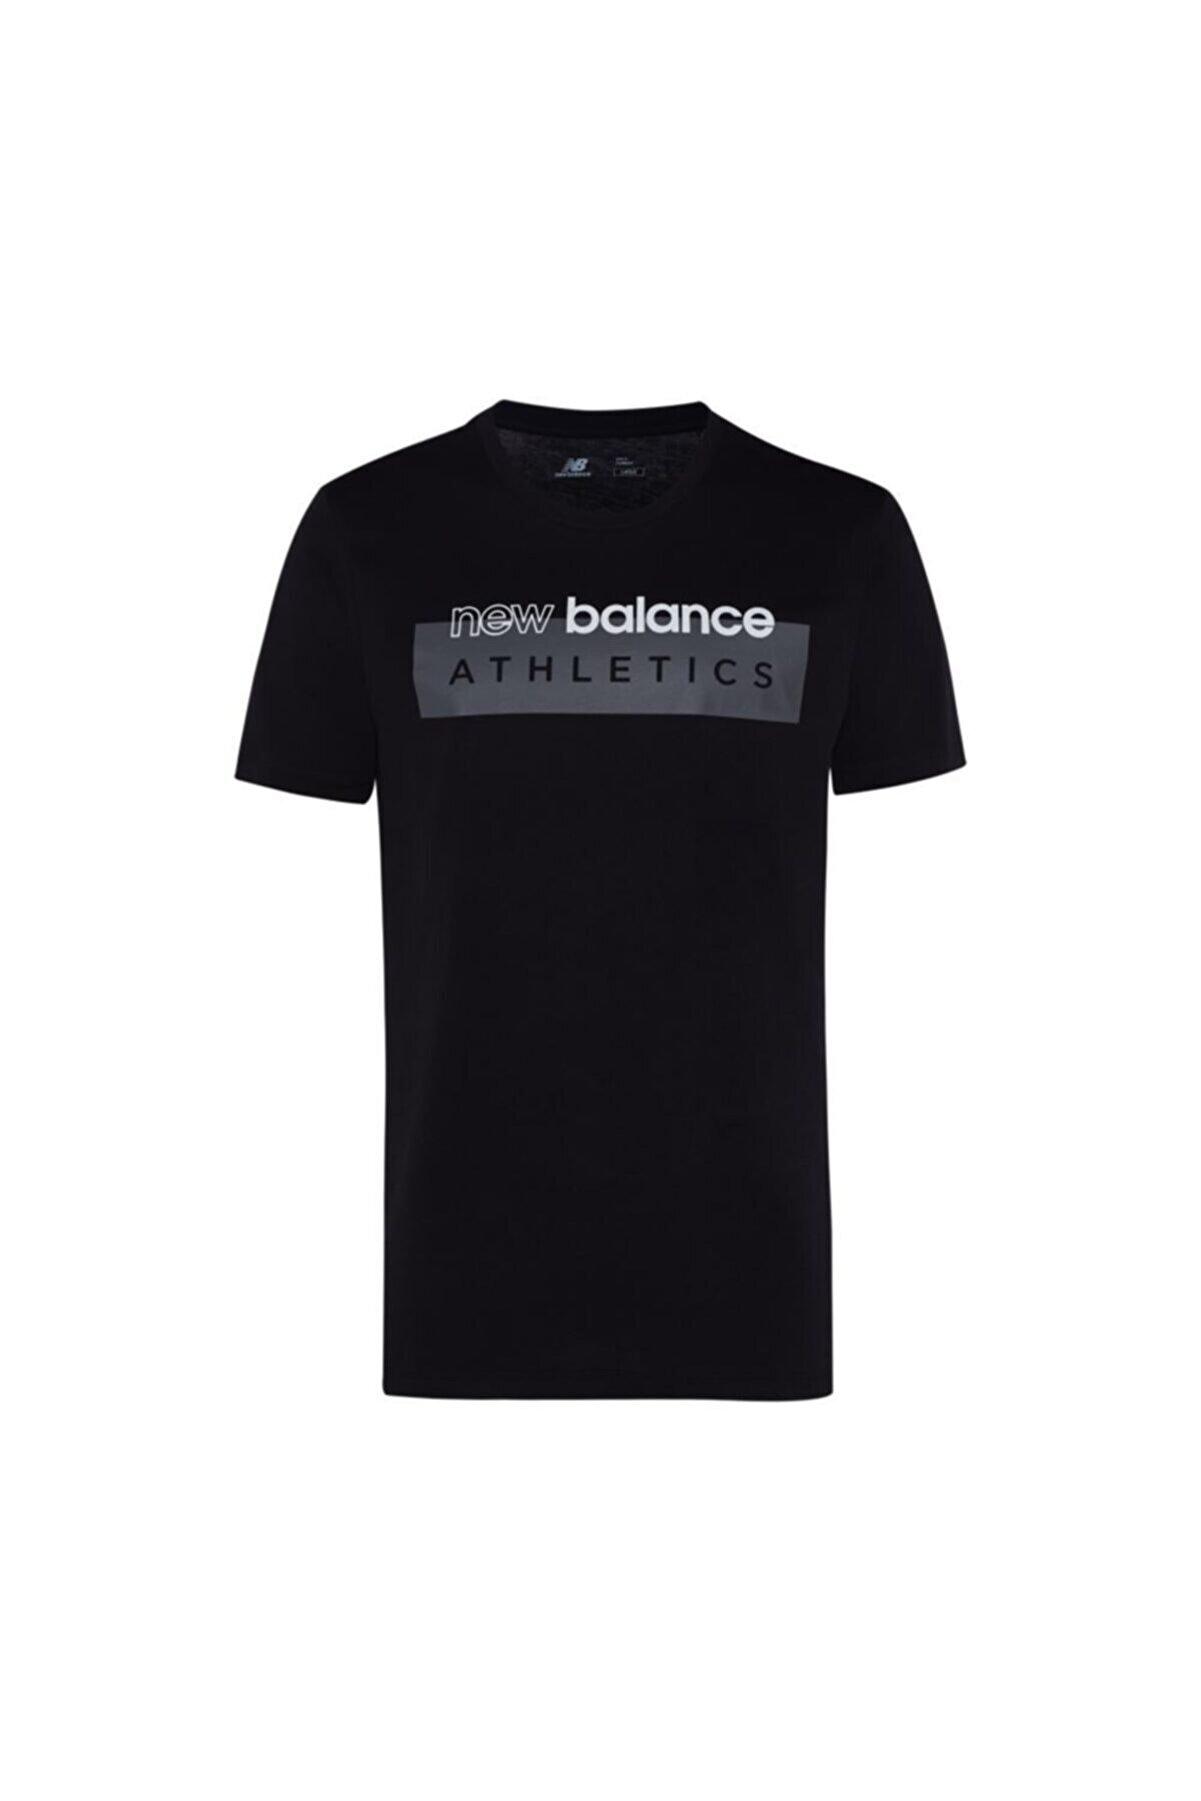 New Balance Mtt919